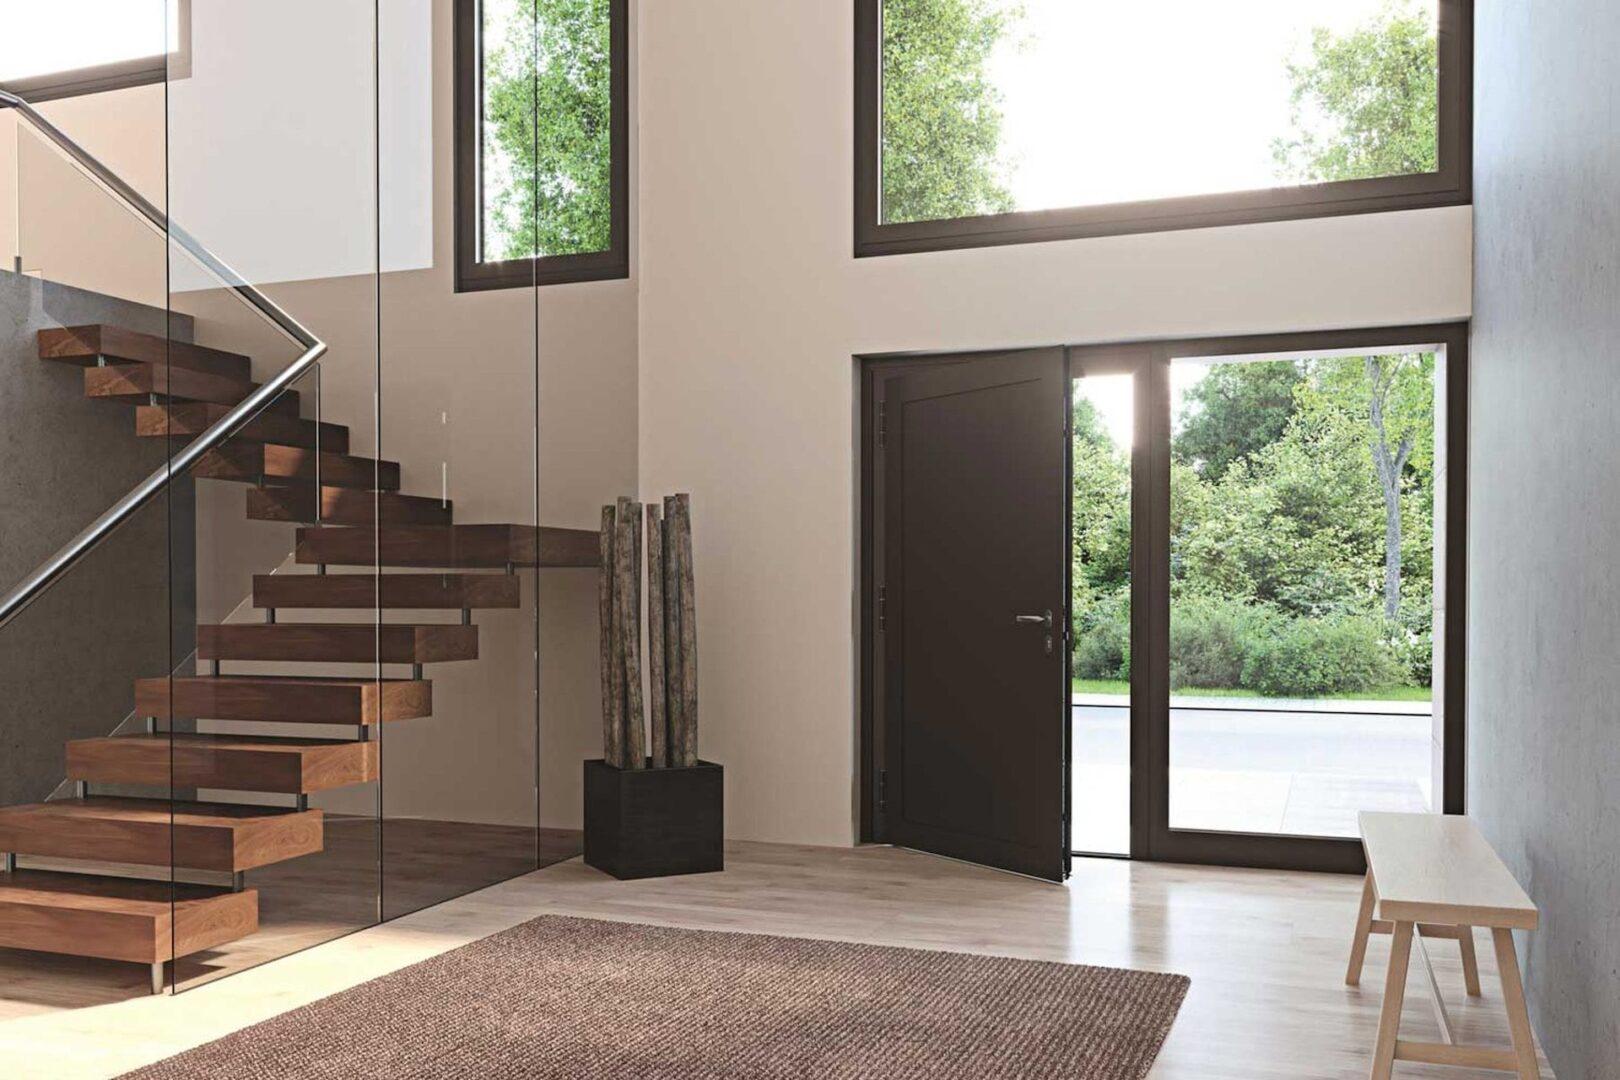 GIWE Haustüren - Le Corbusier Innen